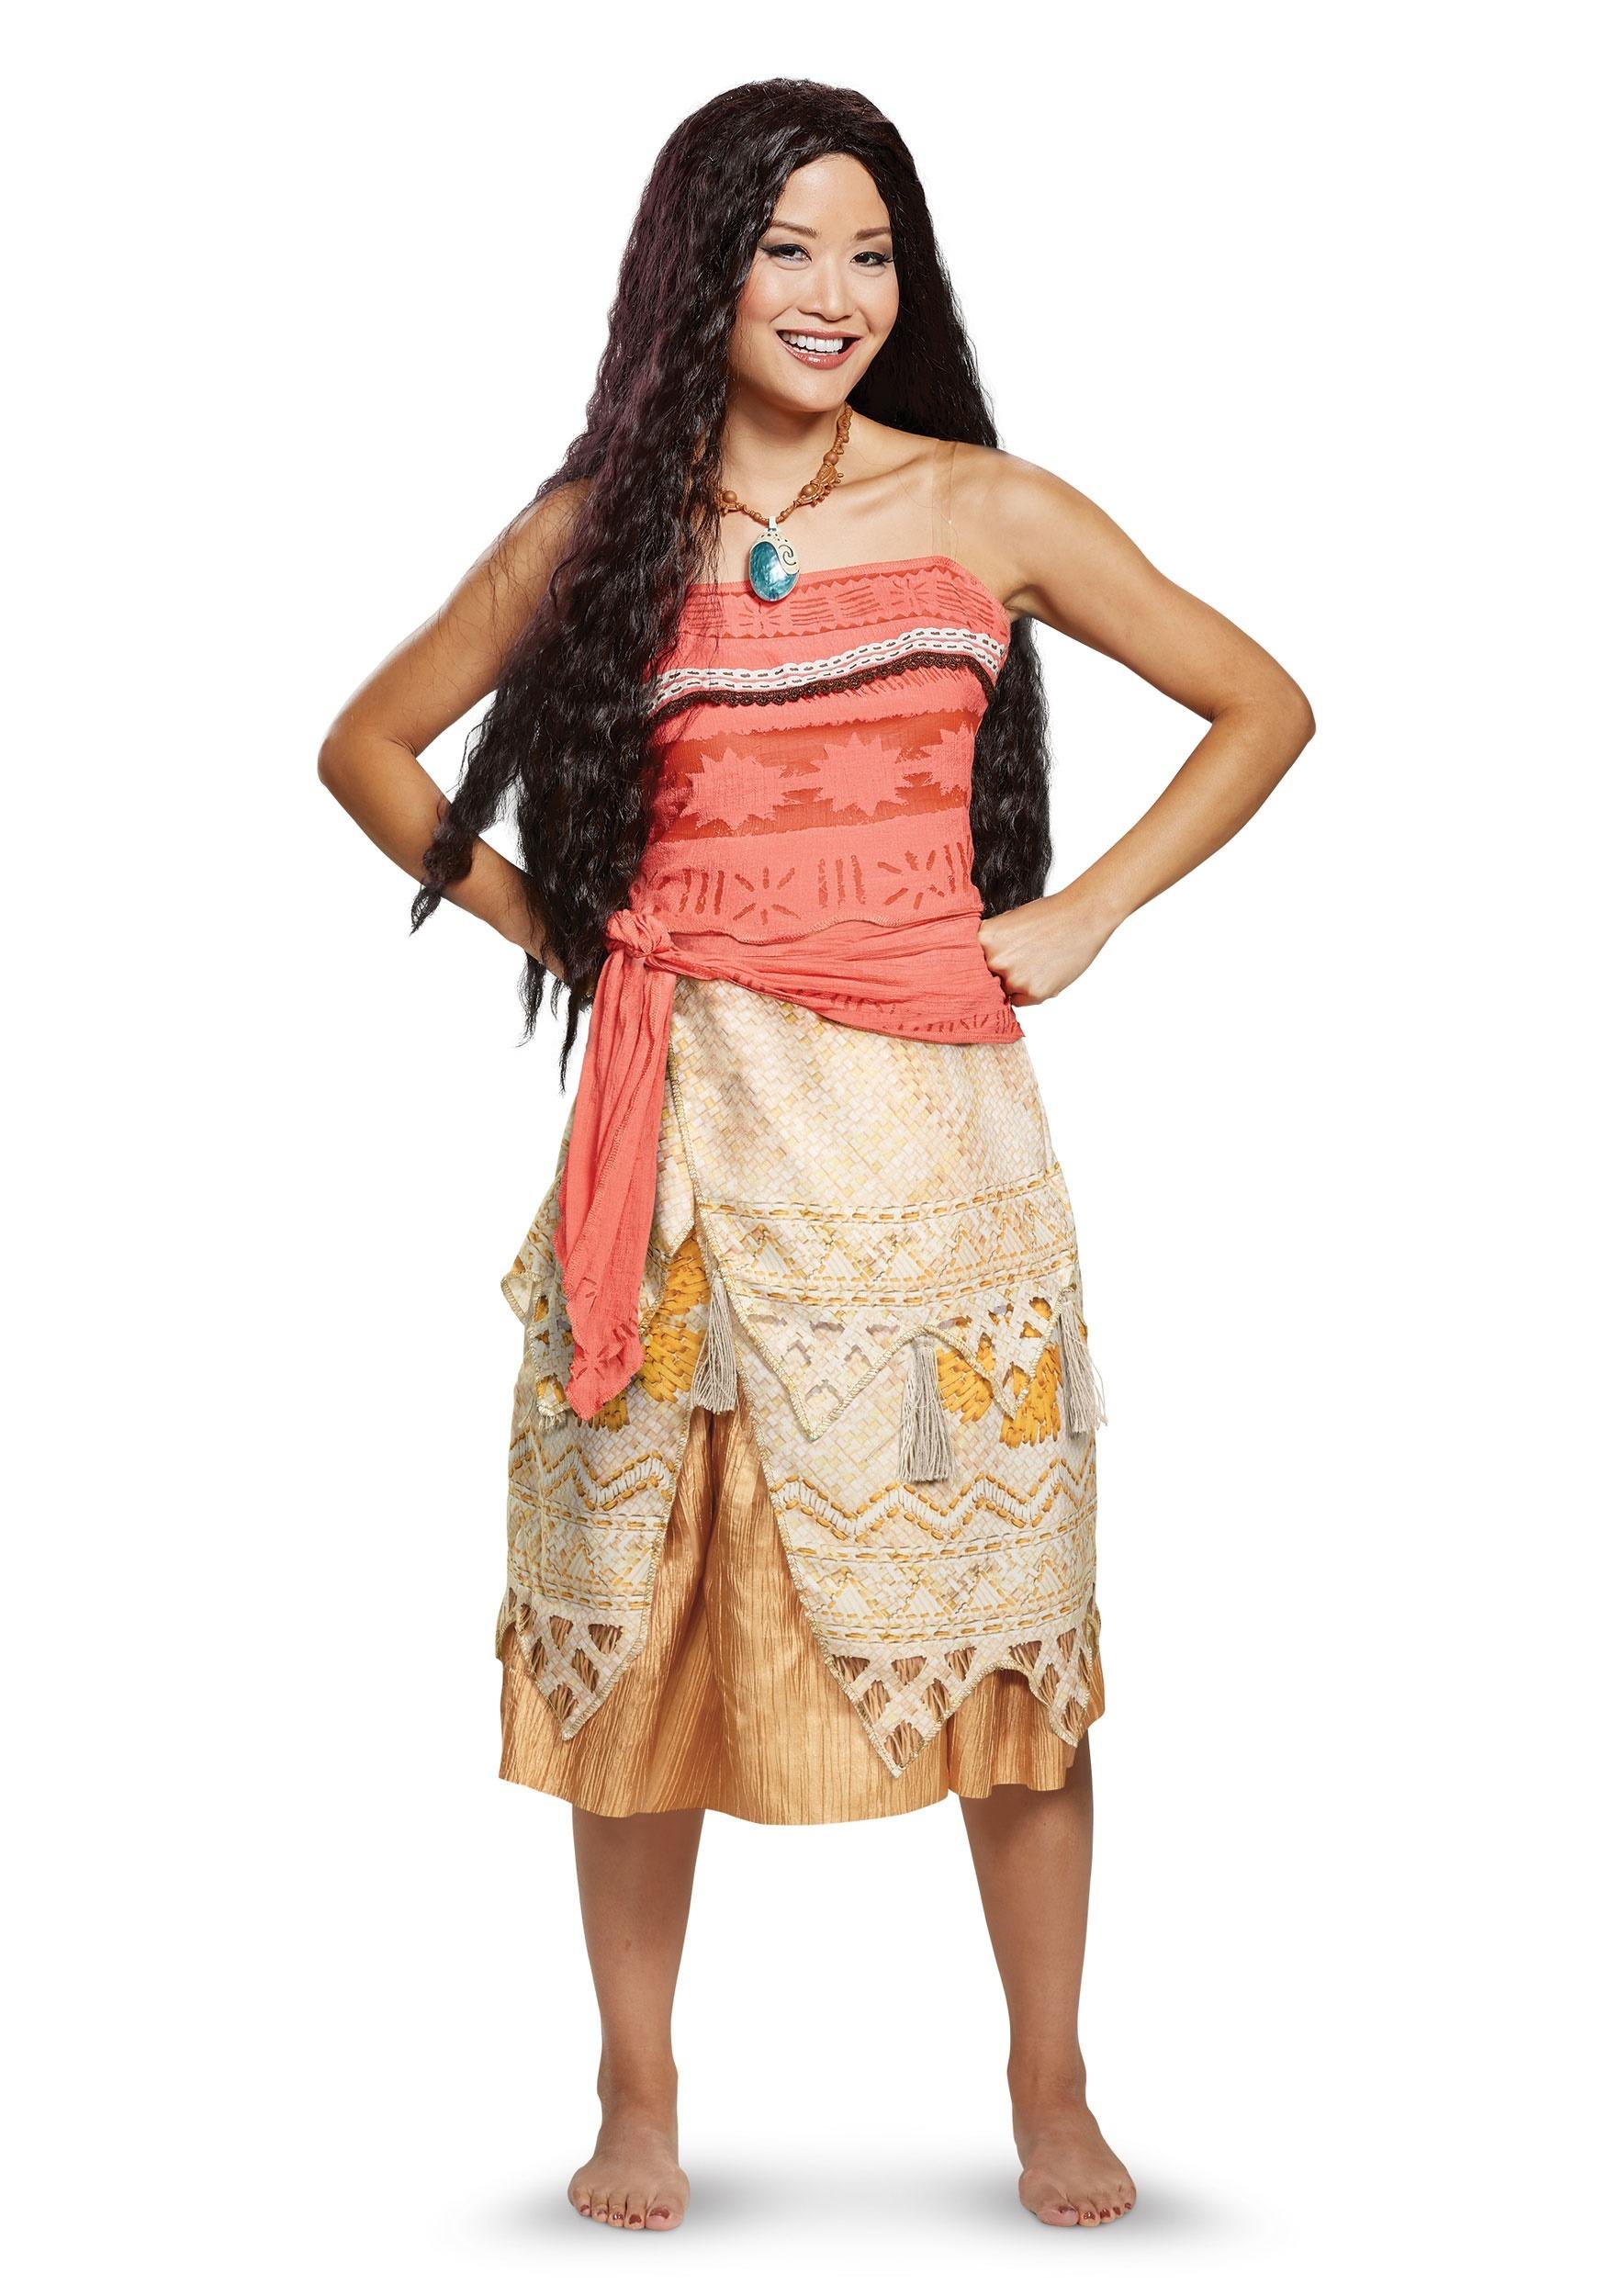 Disney Moana Costume for Women